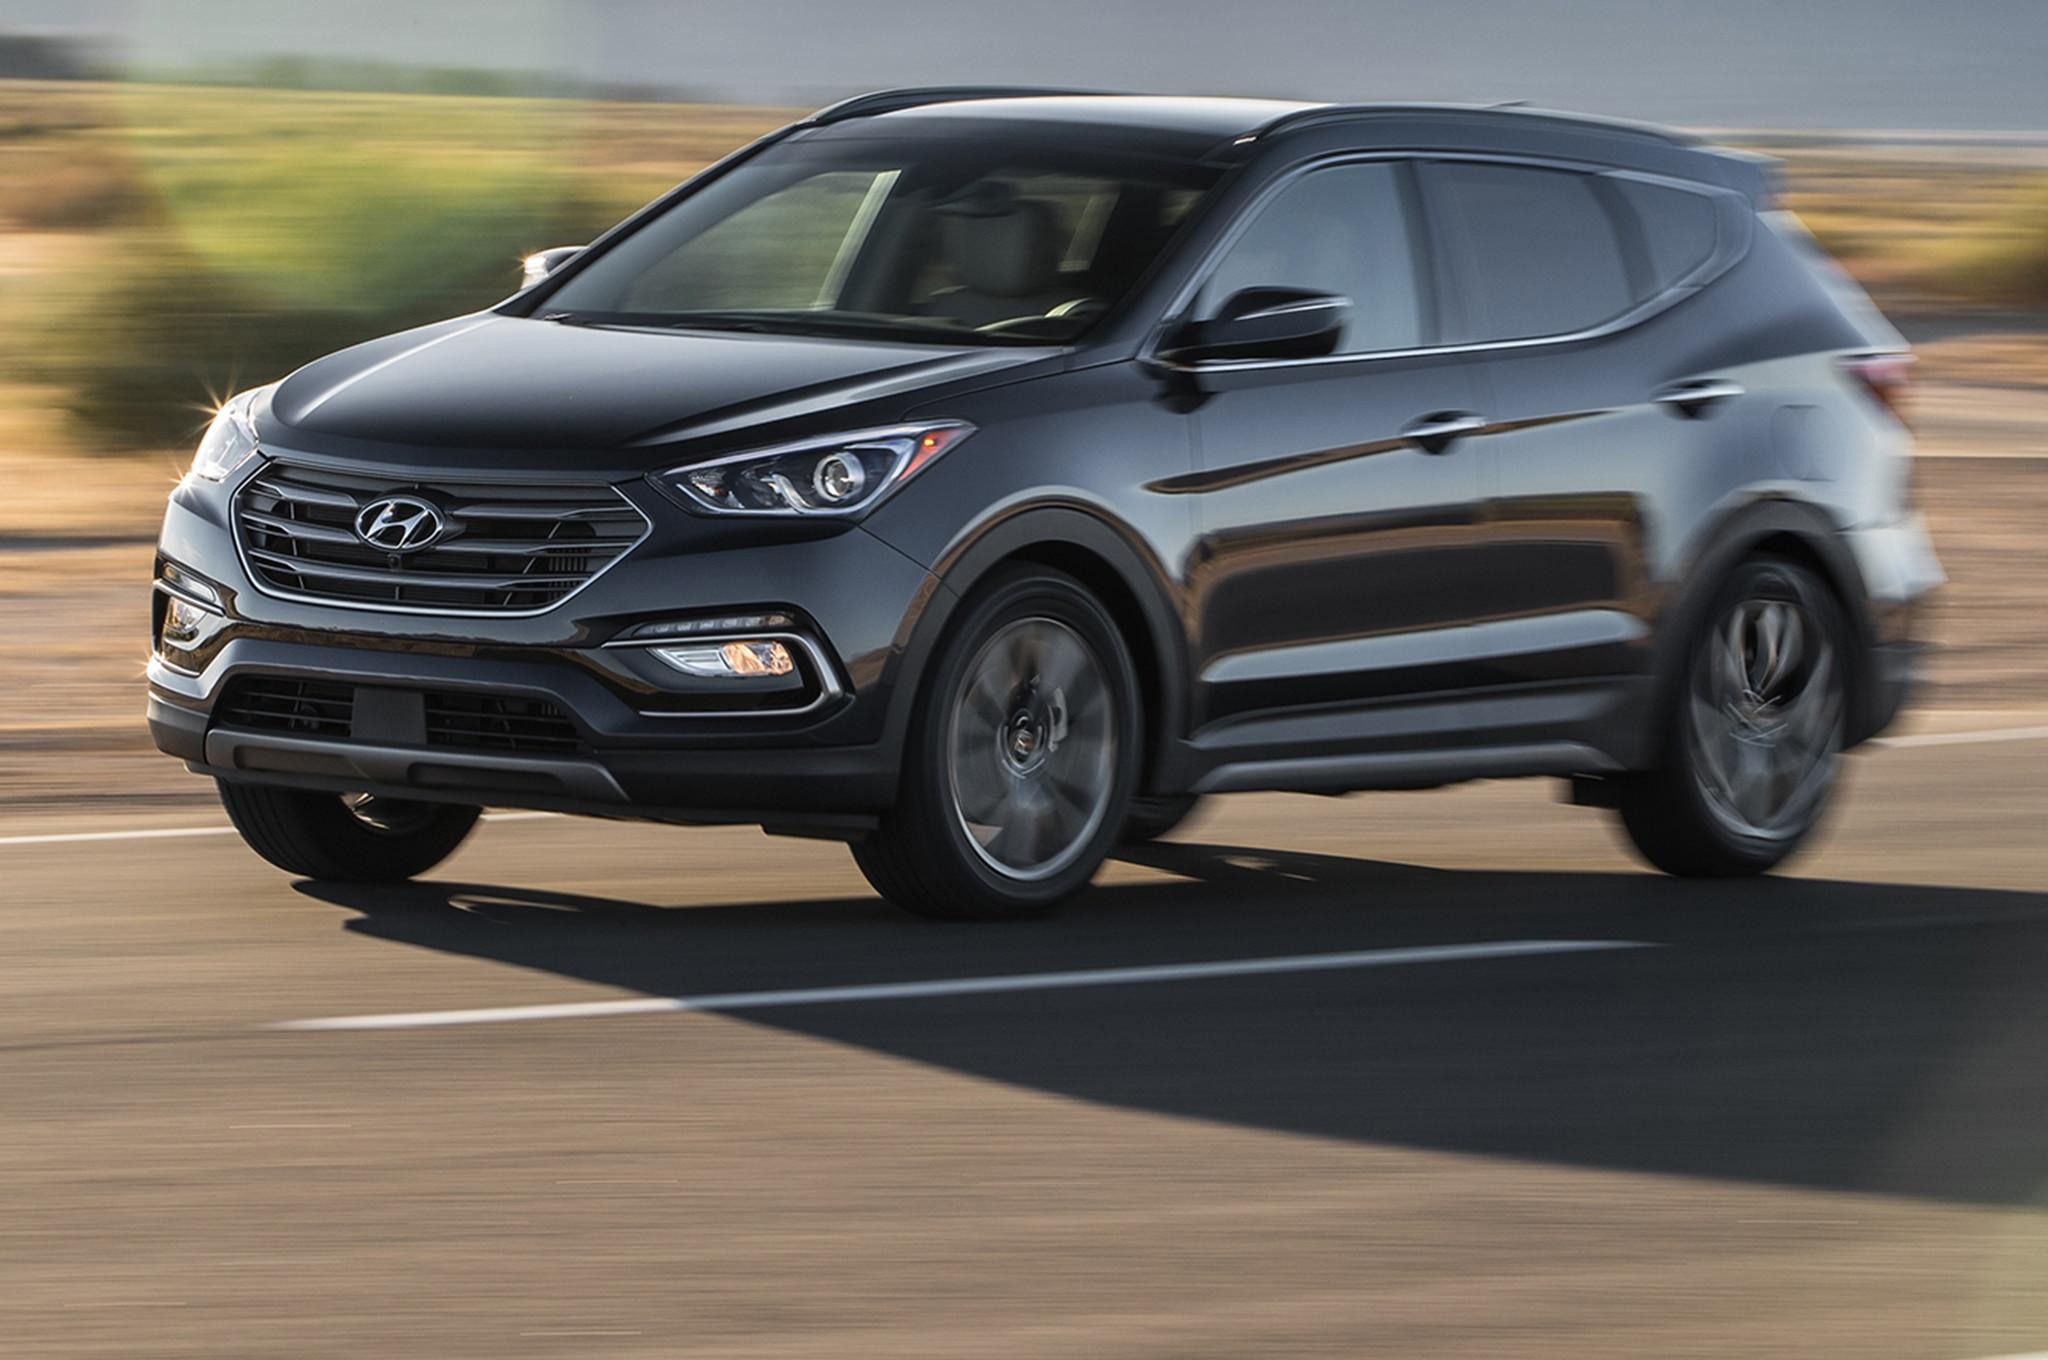 2018 Hyundai Santa Fe Sport Front Three Quarter In Motion 02 1